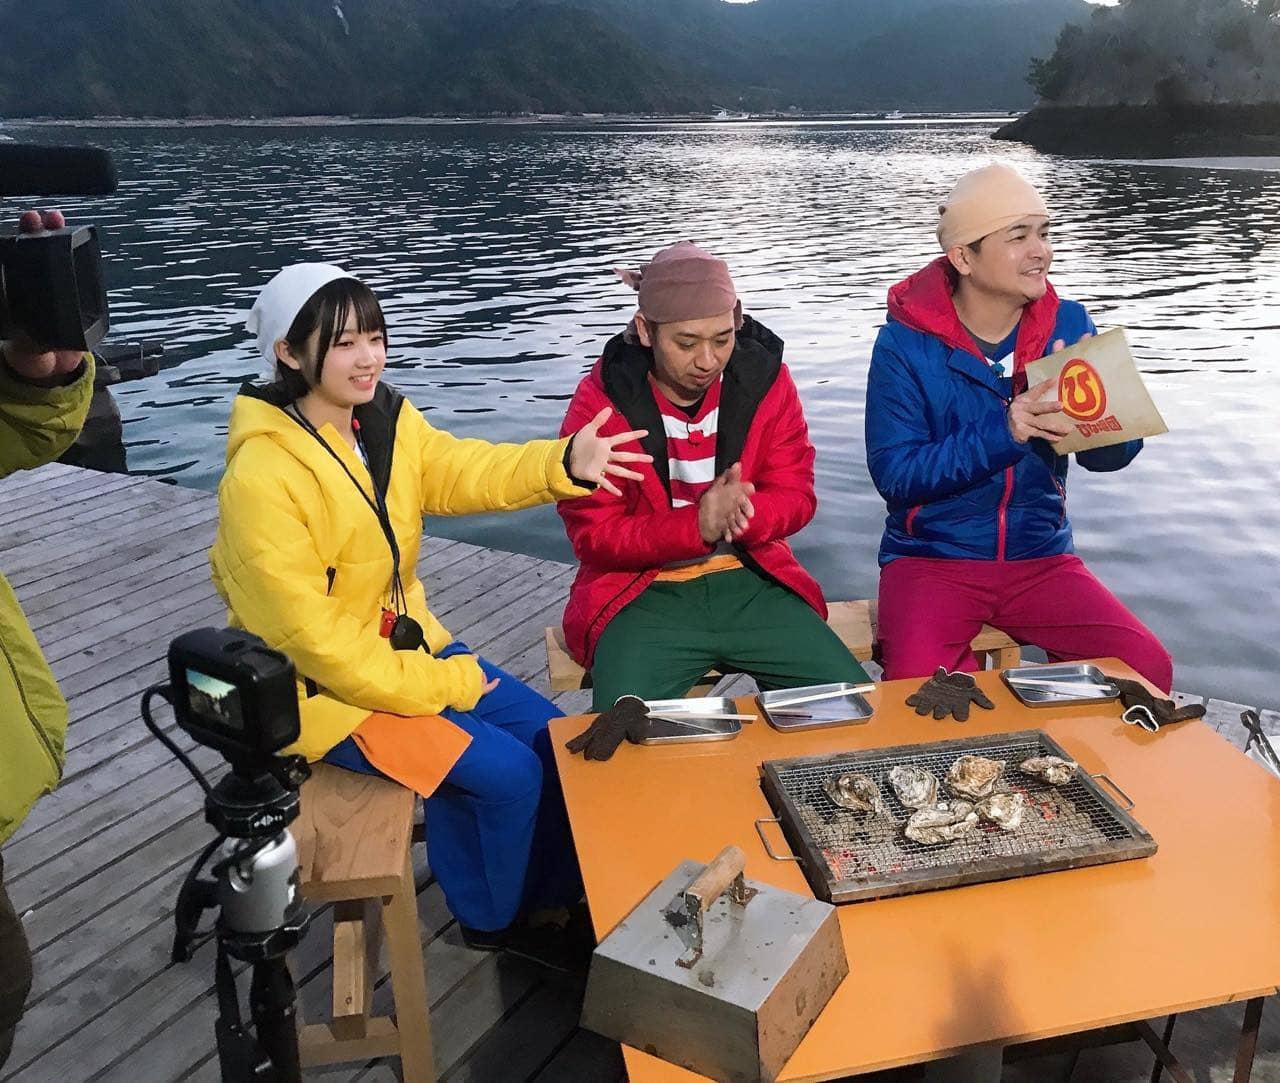 STU48 甲斐心愛が「街頭TV 出没!ひな壇団」に出演、新企画!手作りMAPで千鳥をガイド!